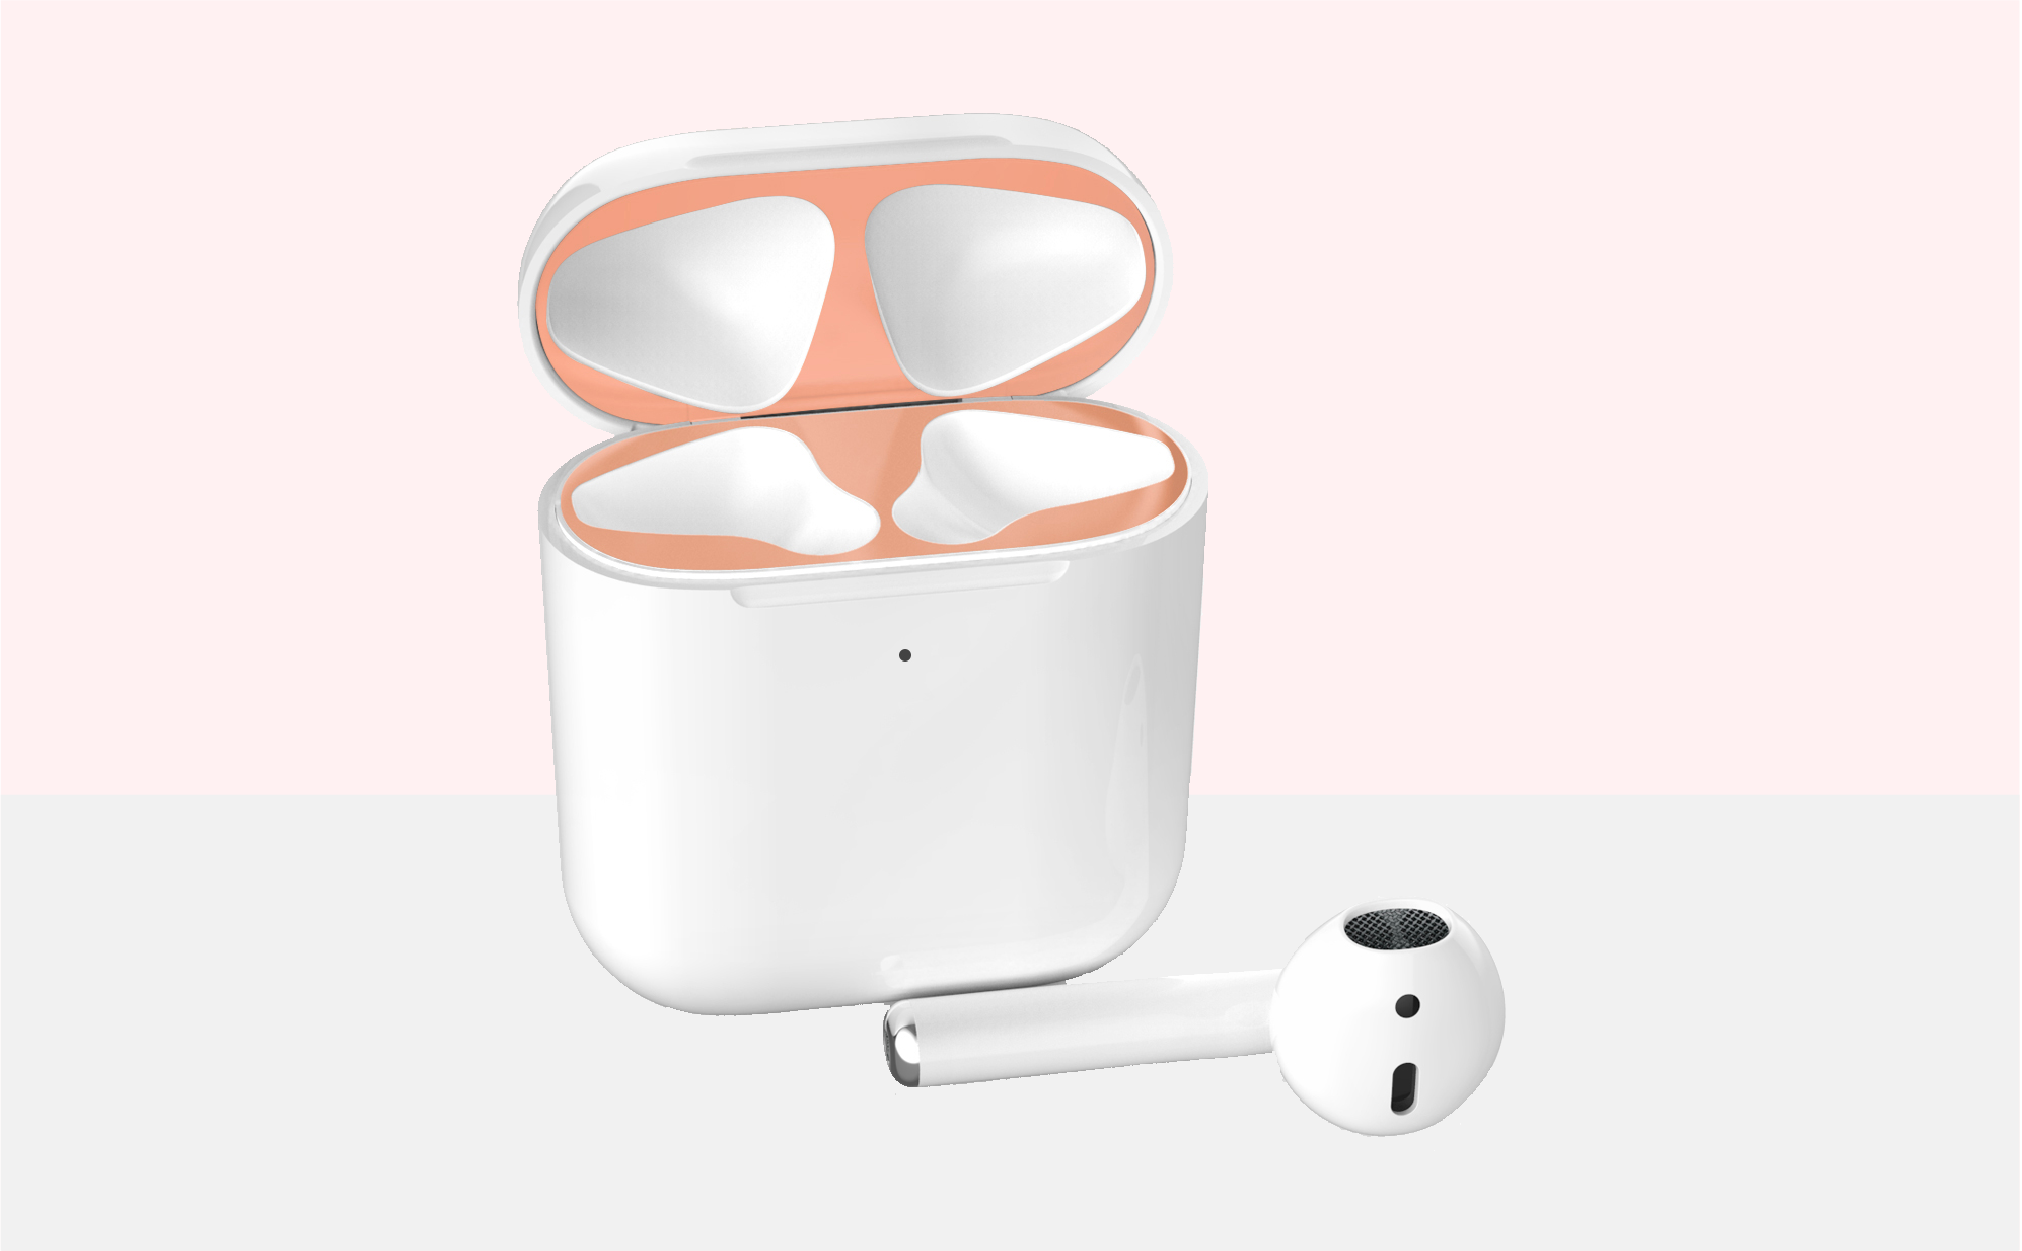 airpods 防塵貼 防髒貼 充電盒髒髒